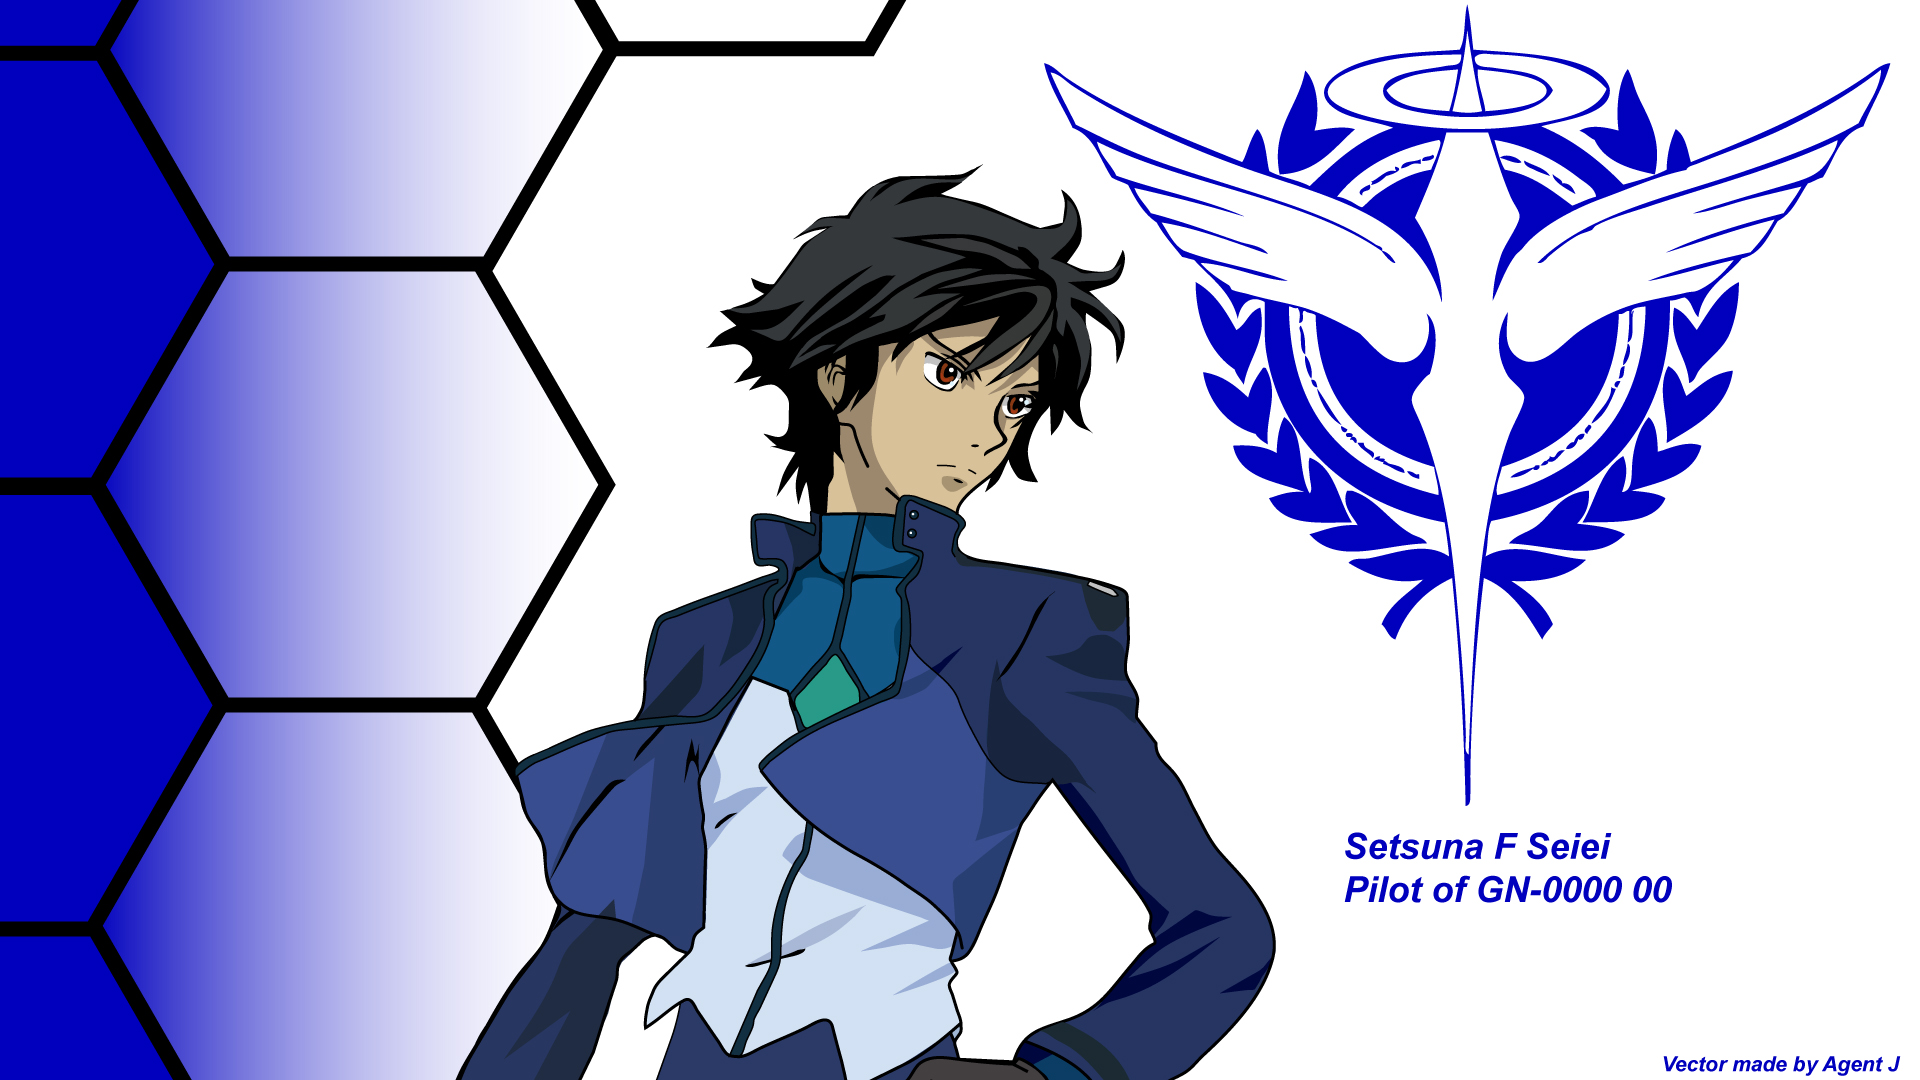 Mobile Suit Gundam 00 Wallpaper Setsuna F Seiei Season 2 Minitokyo